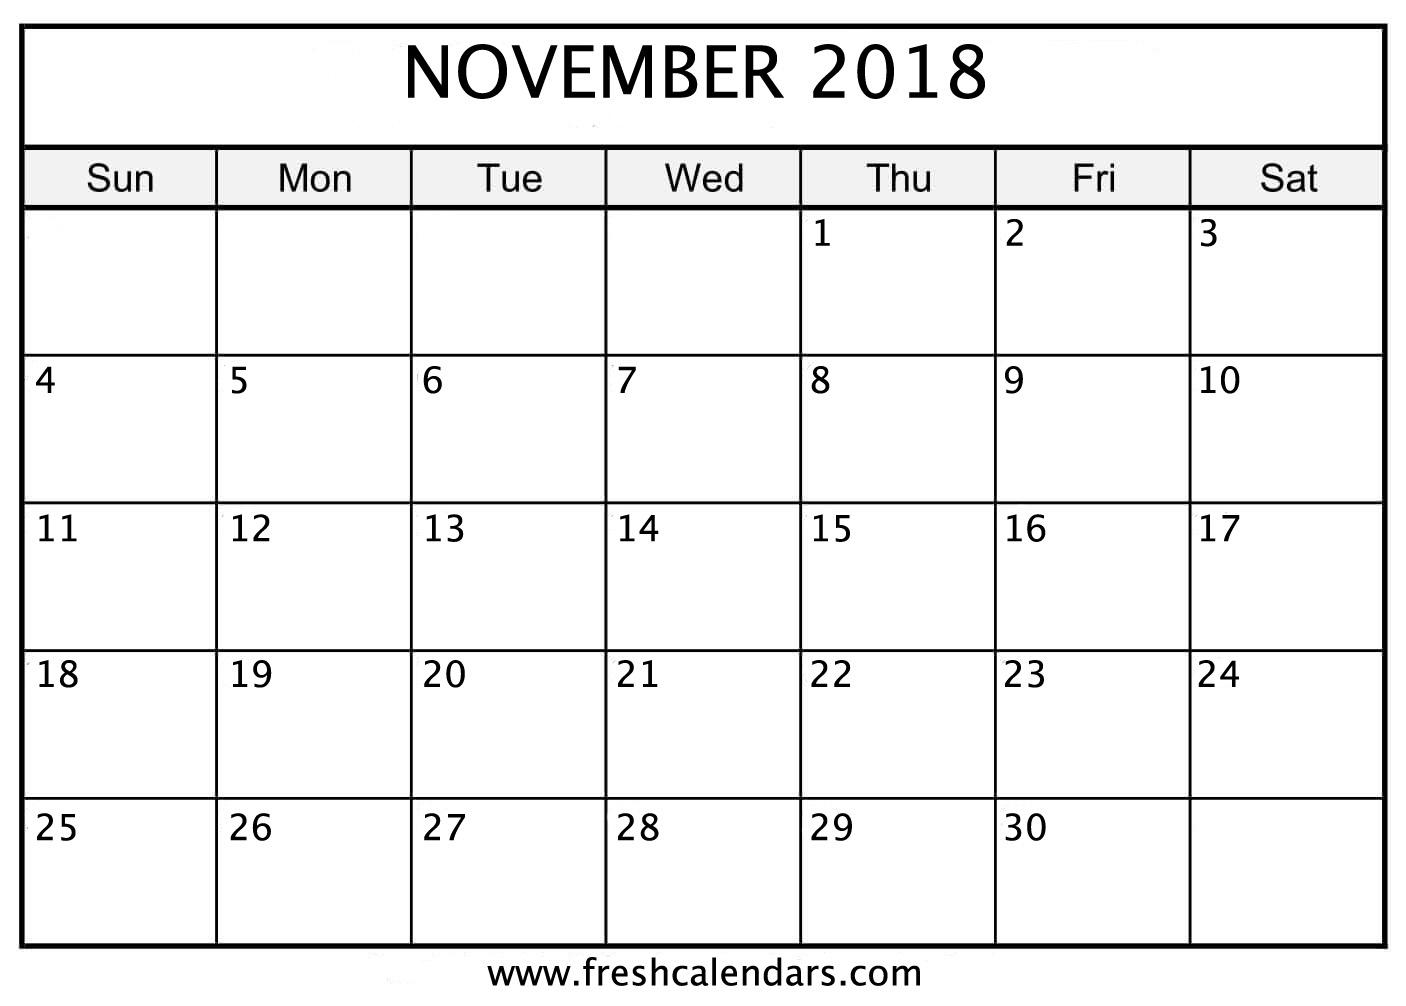 November 2018 Calendar Printable - Fresh Calendars intended for Monday To Sunday Calendar Template November